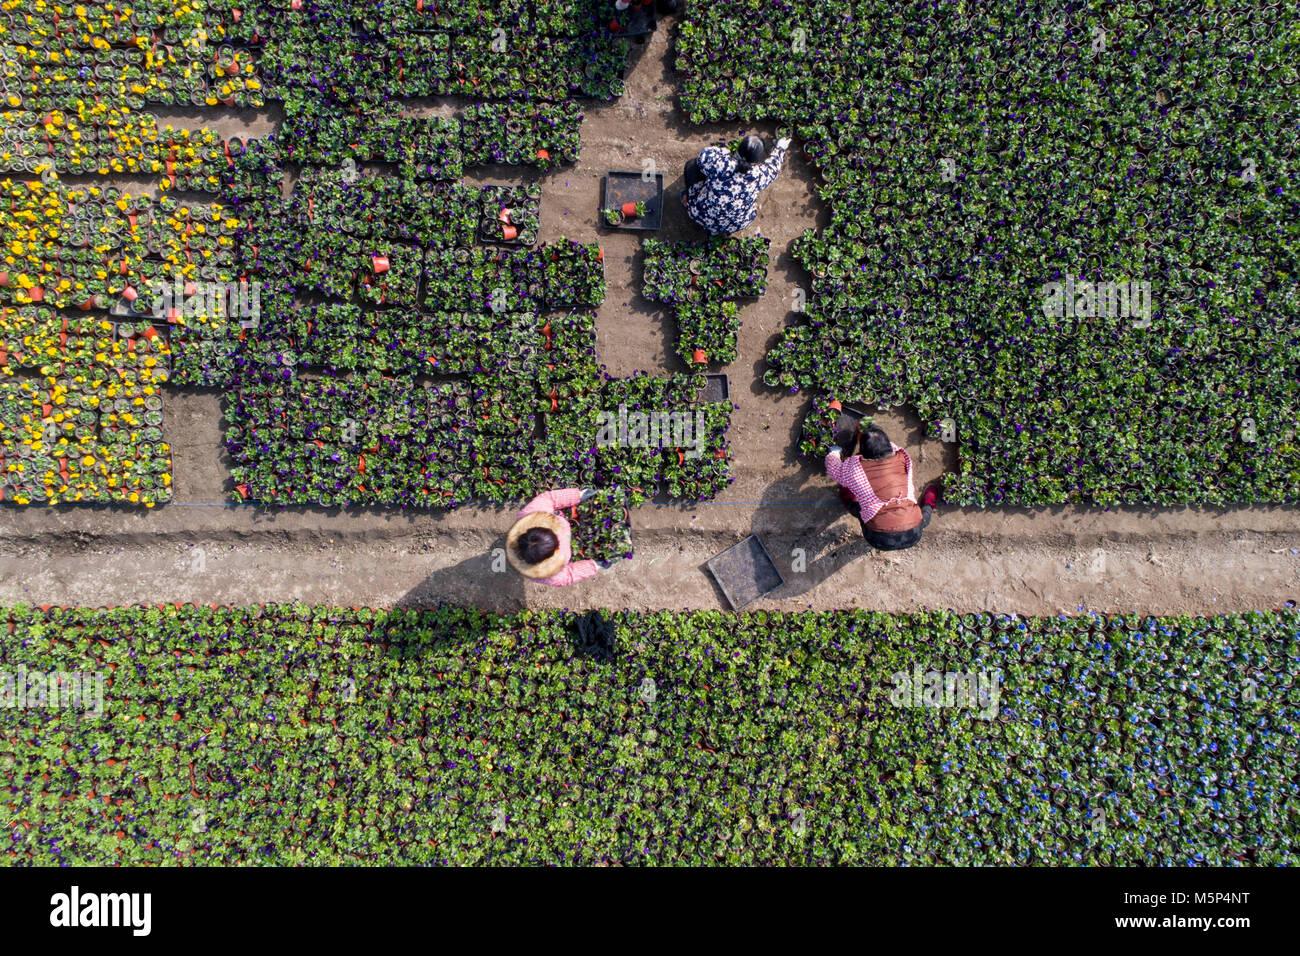 Beijing, Chine, province de Jiangsu. Feb 25, 2018. Horticulteurs prendre soin de fleurs dans un jardin agricole Photo Stock